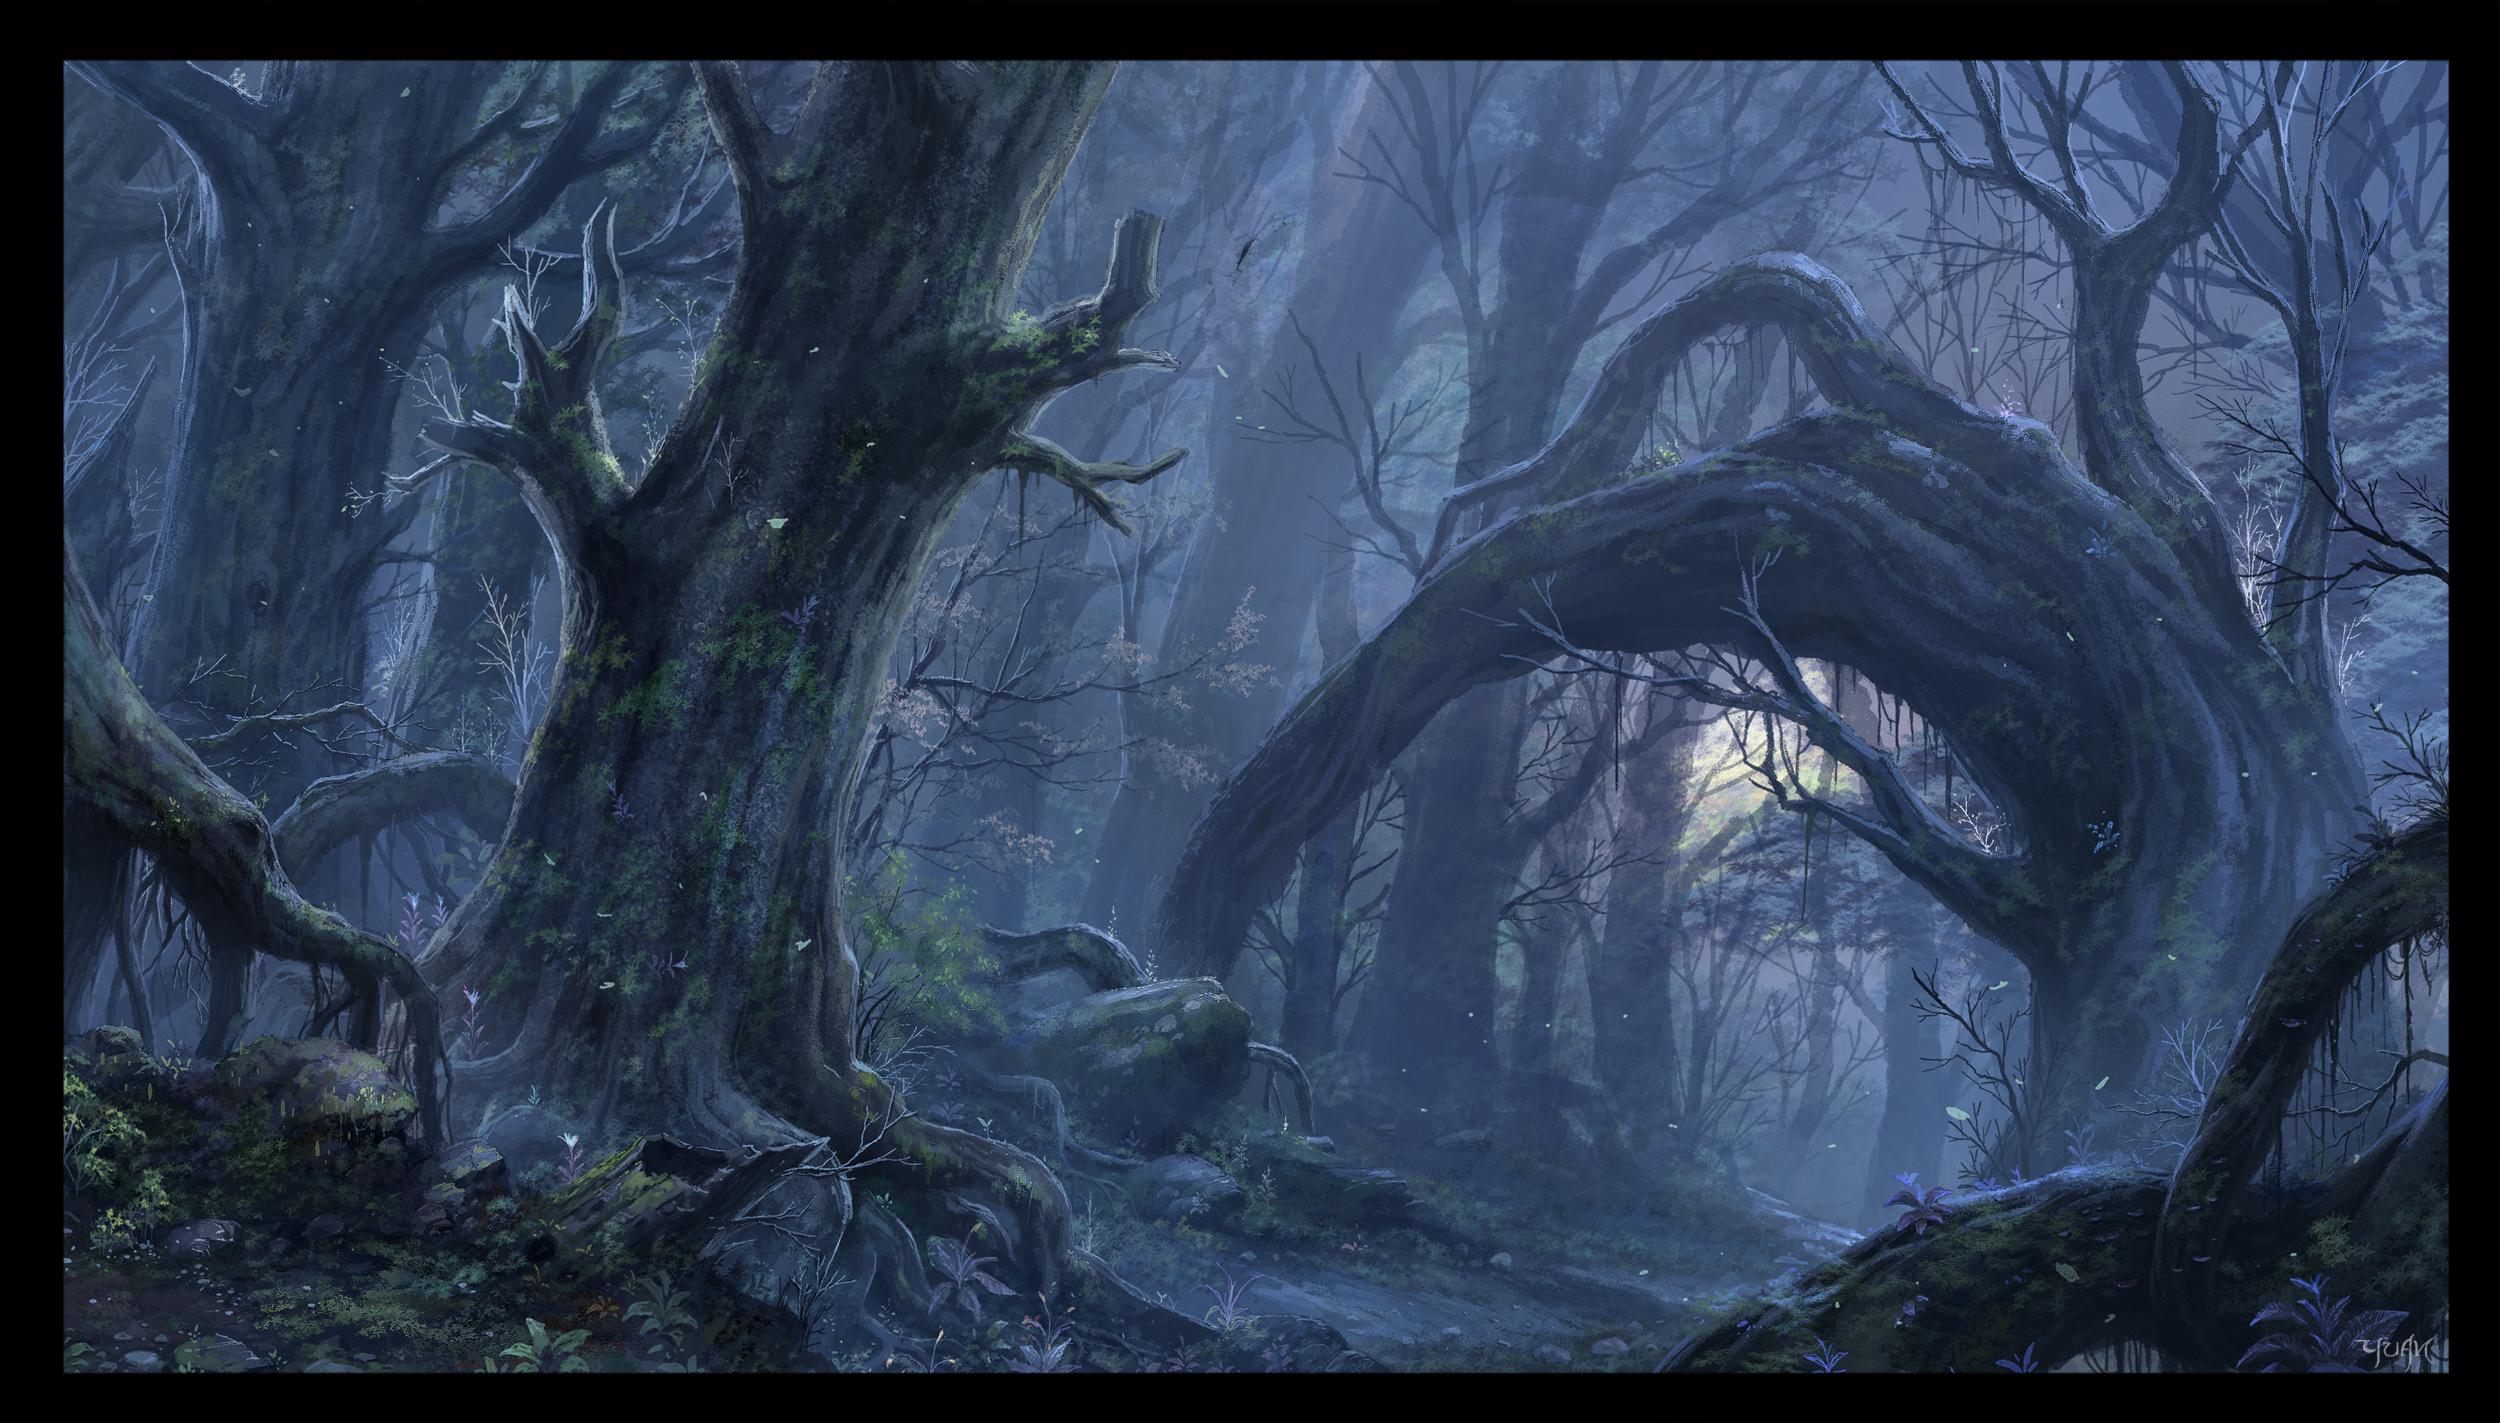 the_misty_wood_by_chaoyuanxu-d4fvdy0